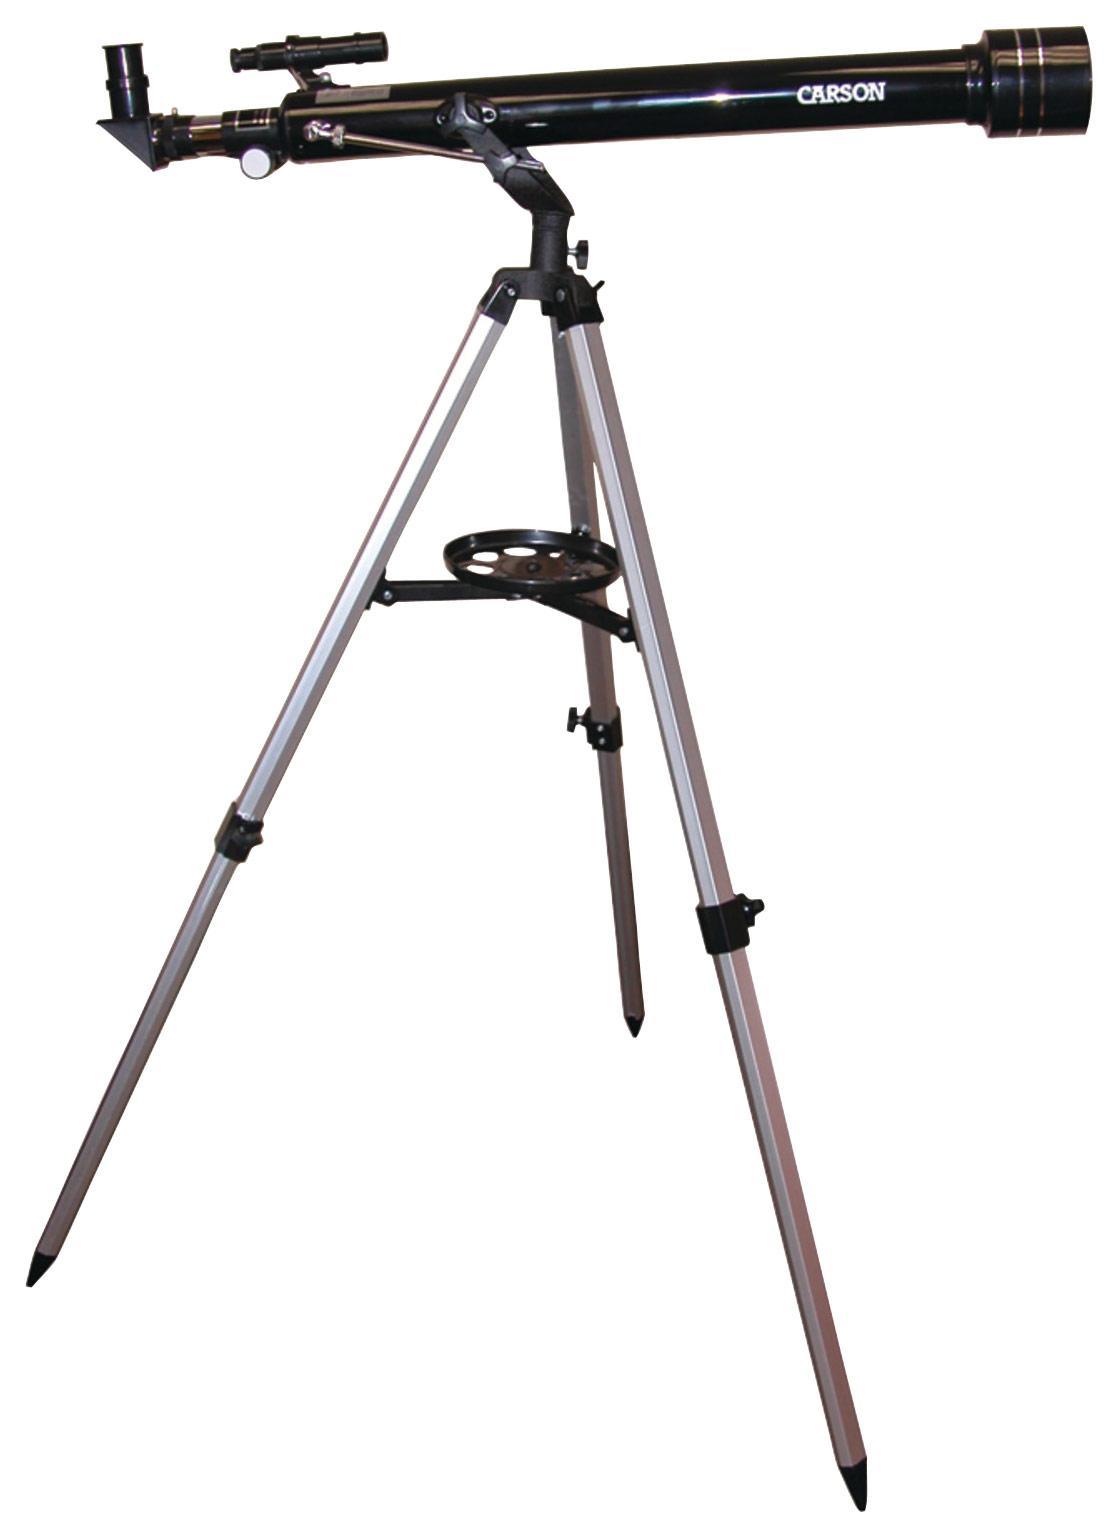 Carson Skyseeker 60mm Refractor Telescope Black JC-1000